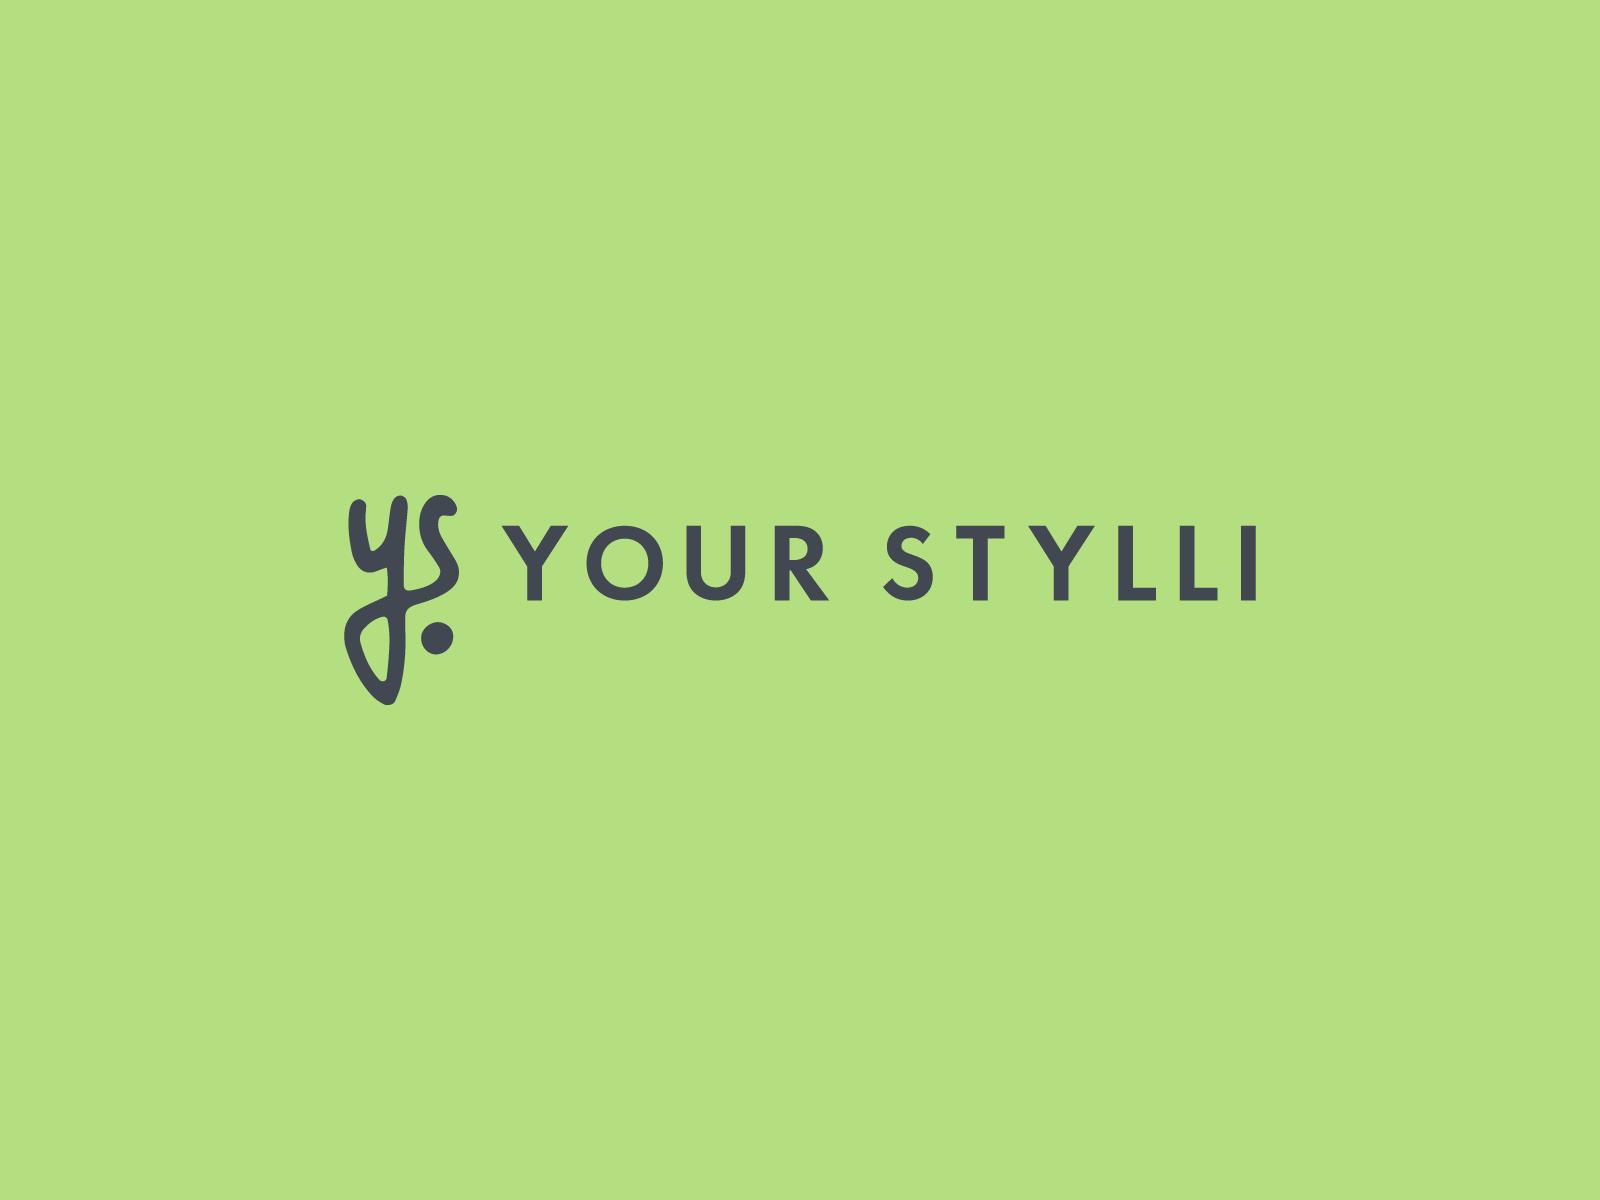 Your Stylli